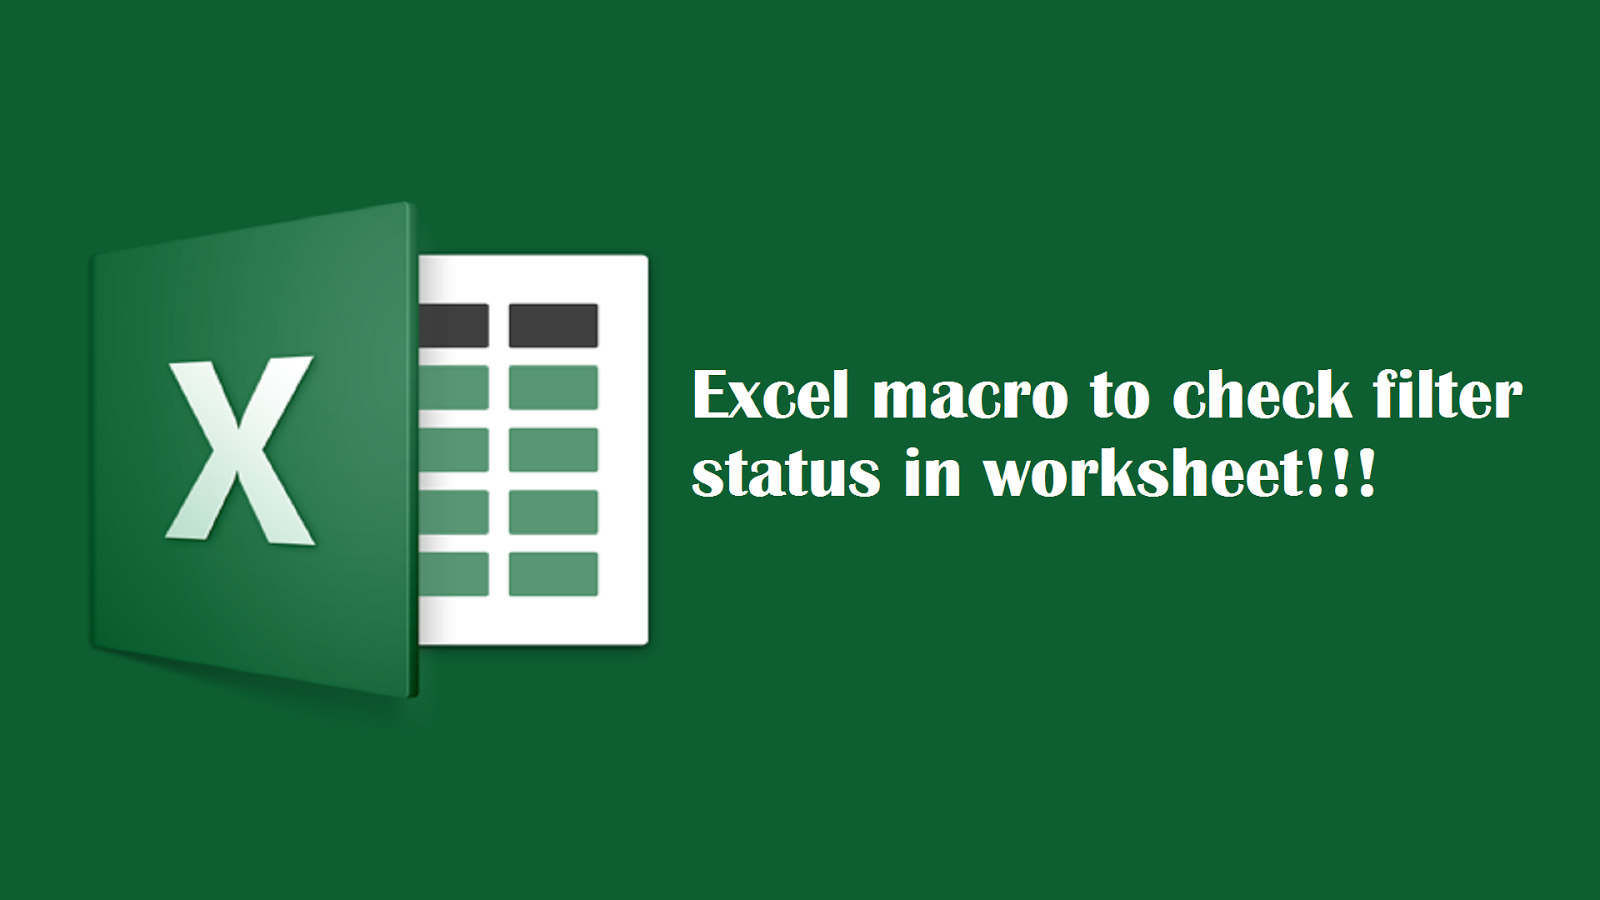 Excel Macro To Check Filter Status In Worksheet